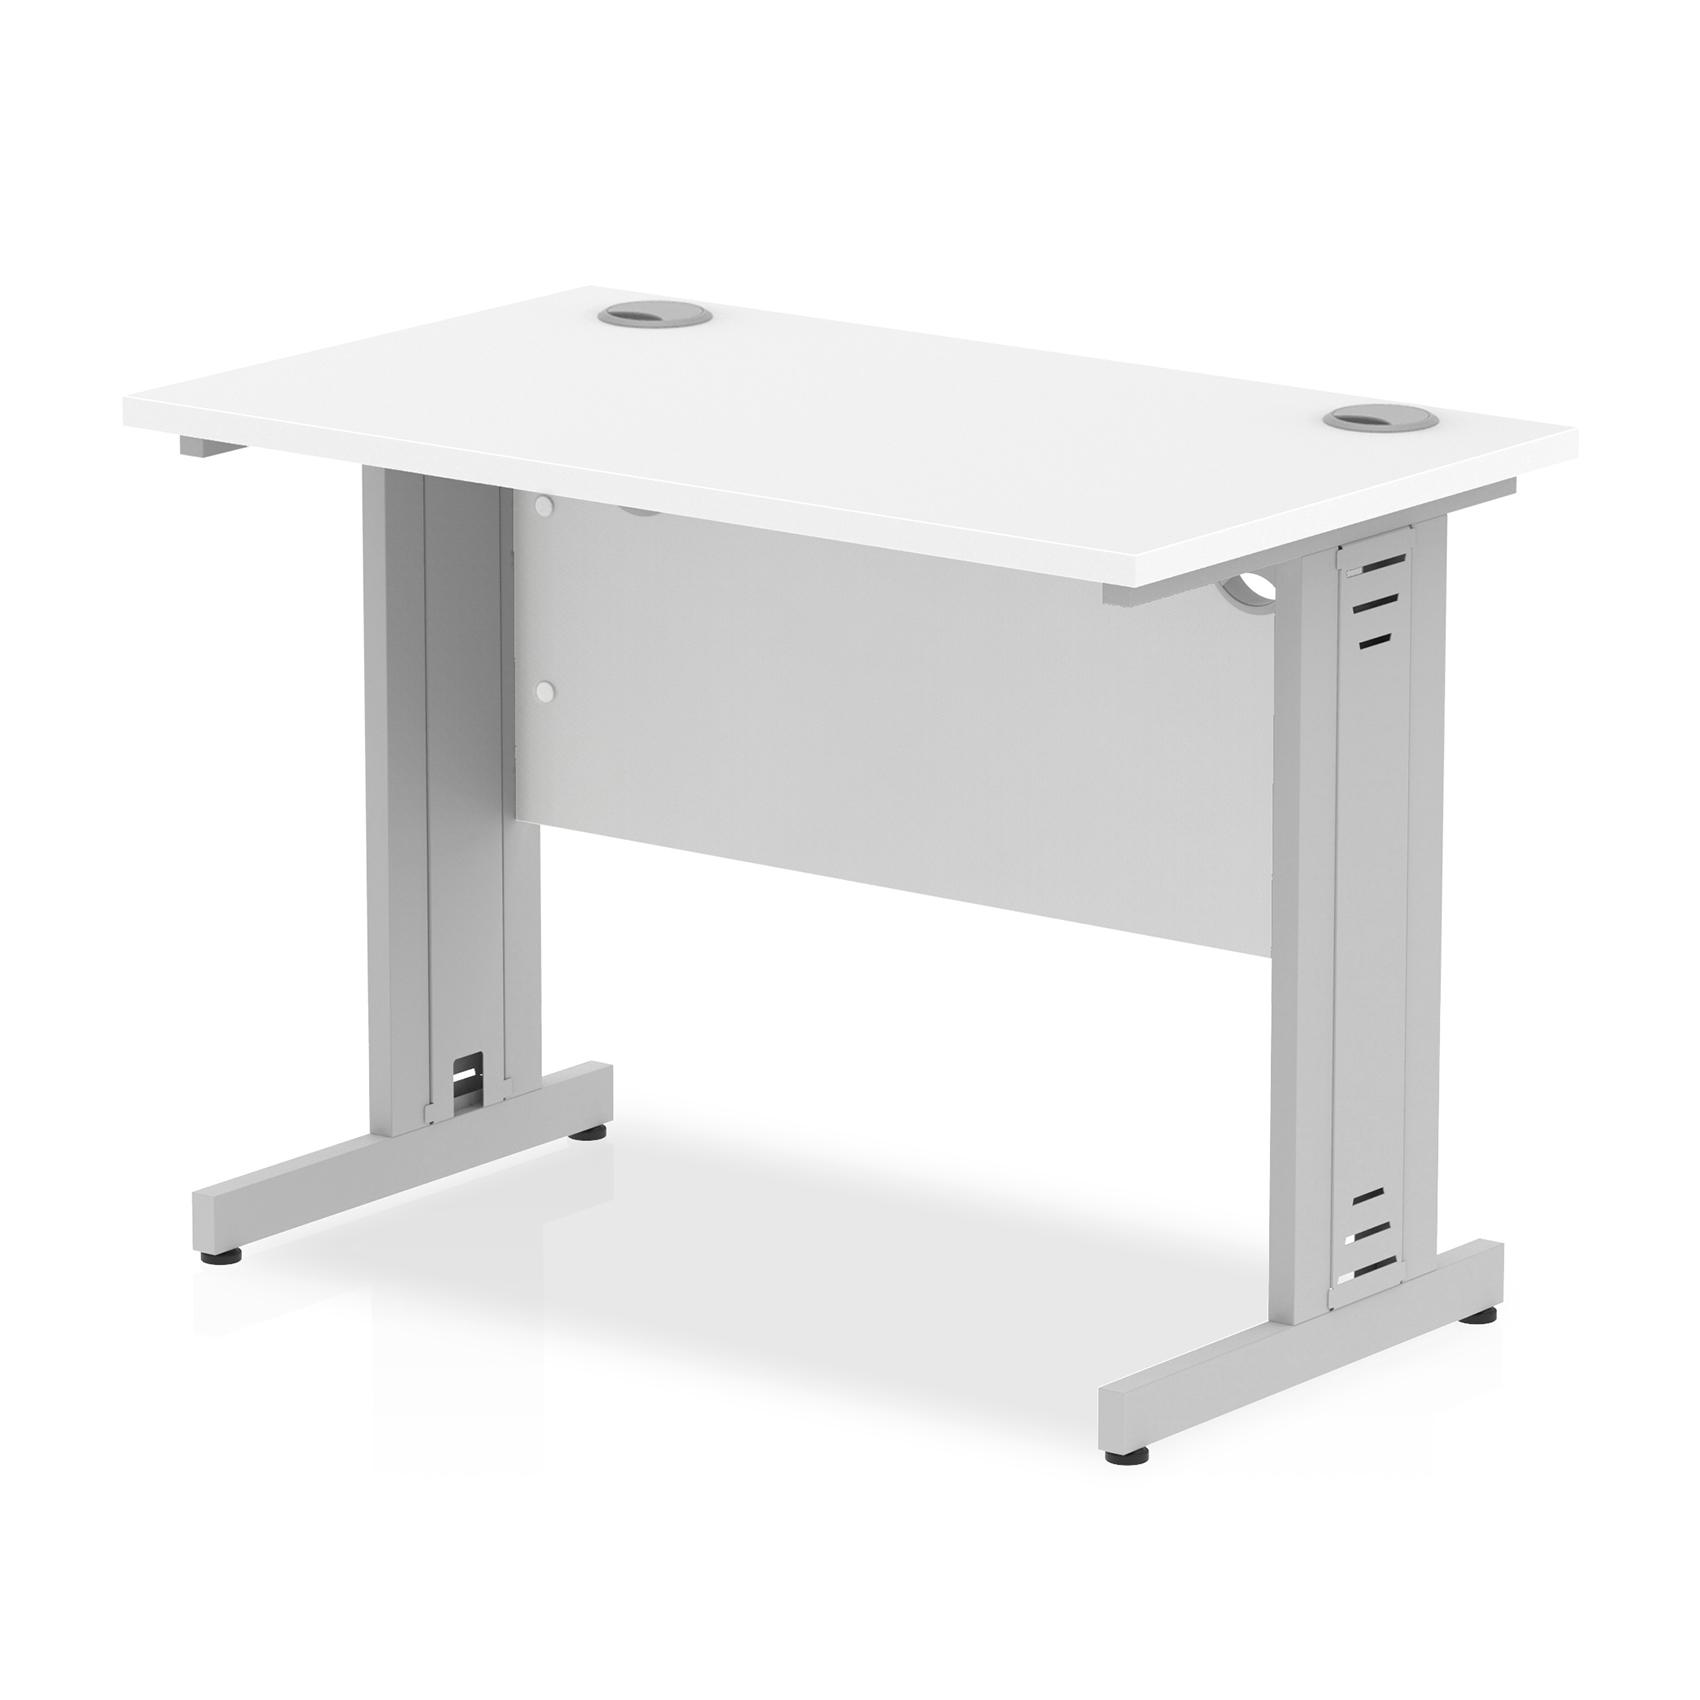 Trexus Desk Rectangle Cable Managed White Leg 1000x600mm White Ref MI002280